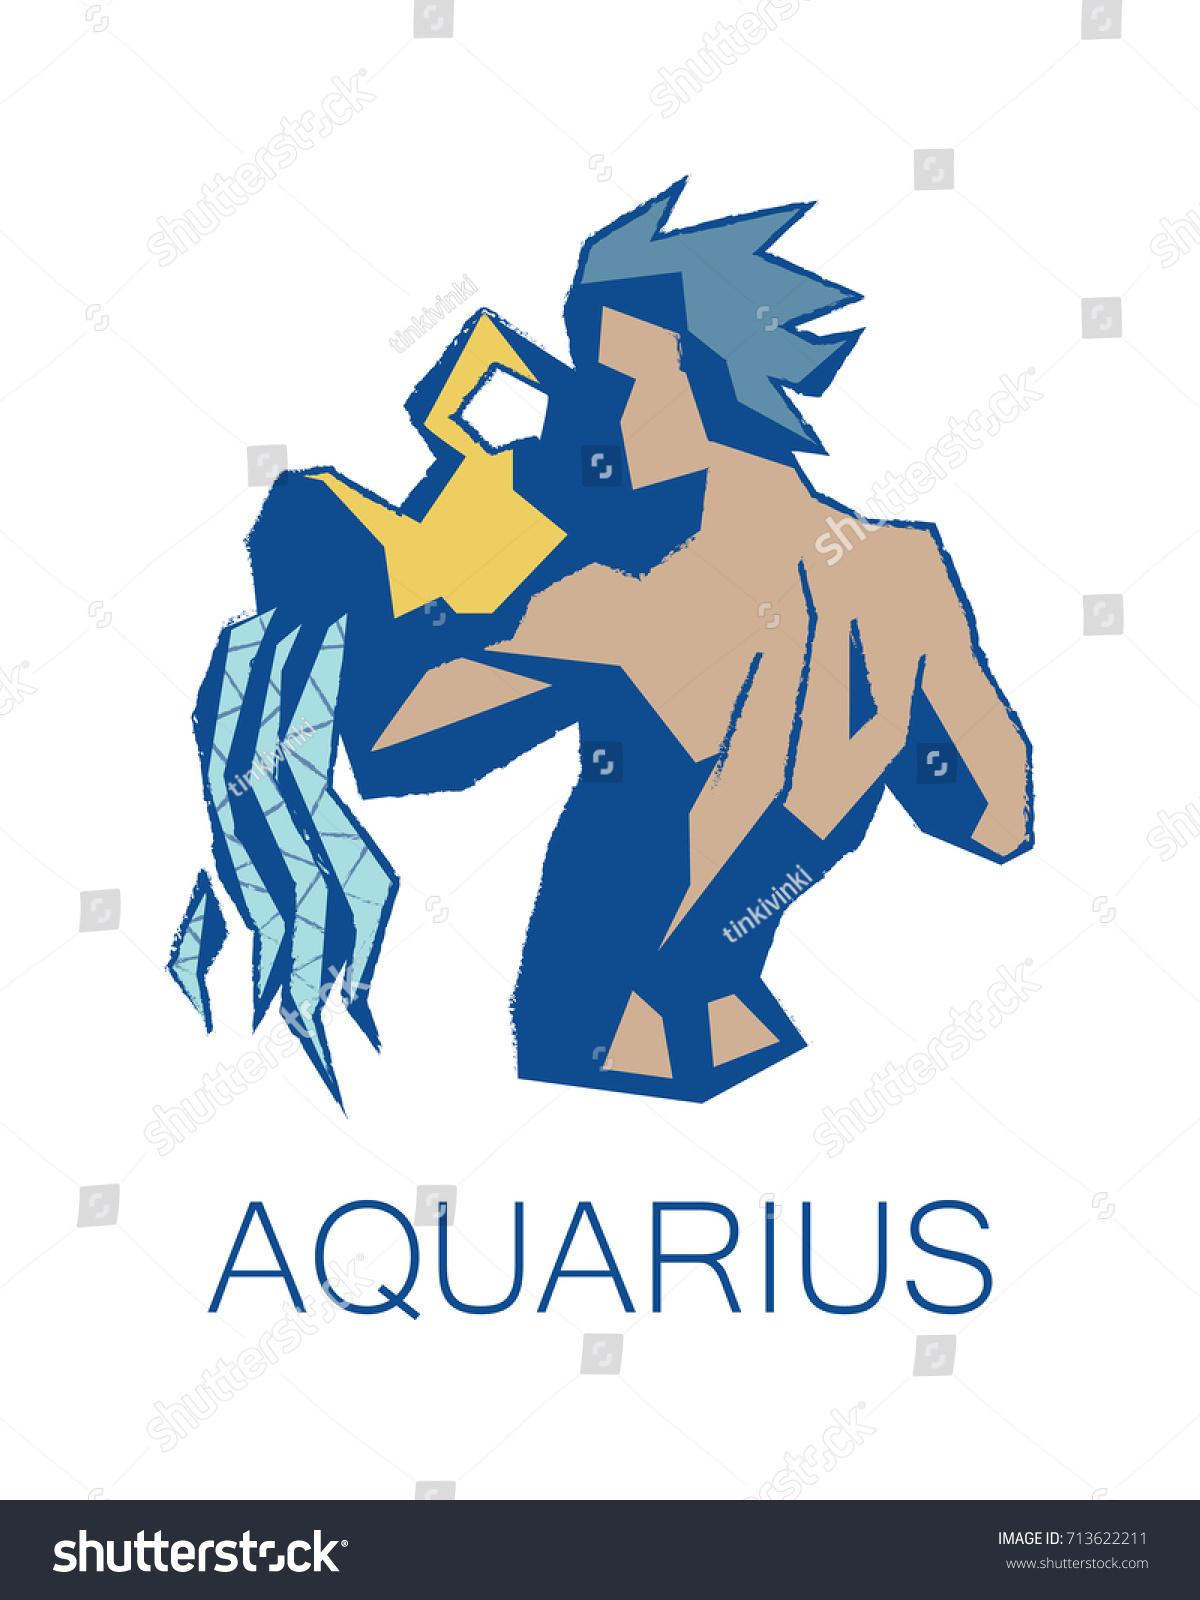 Aquarius Zodiac Sign Astrology Symbol Vector Stock Vector Royalty